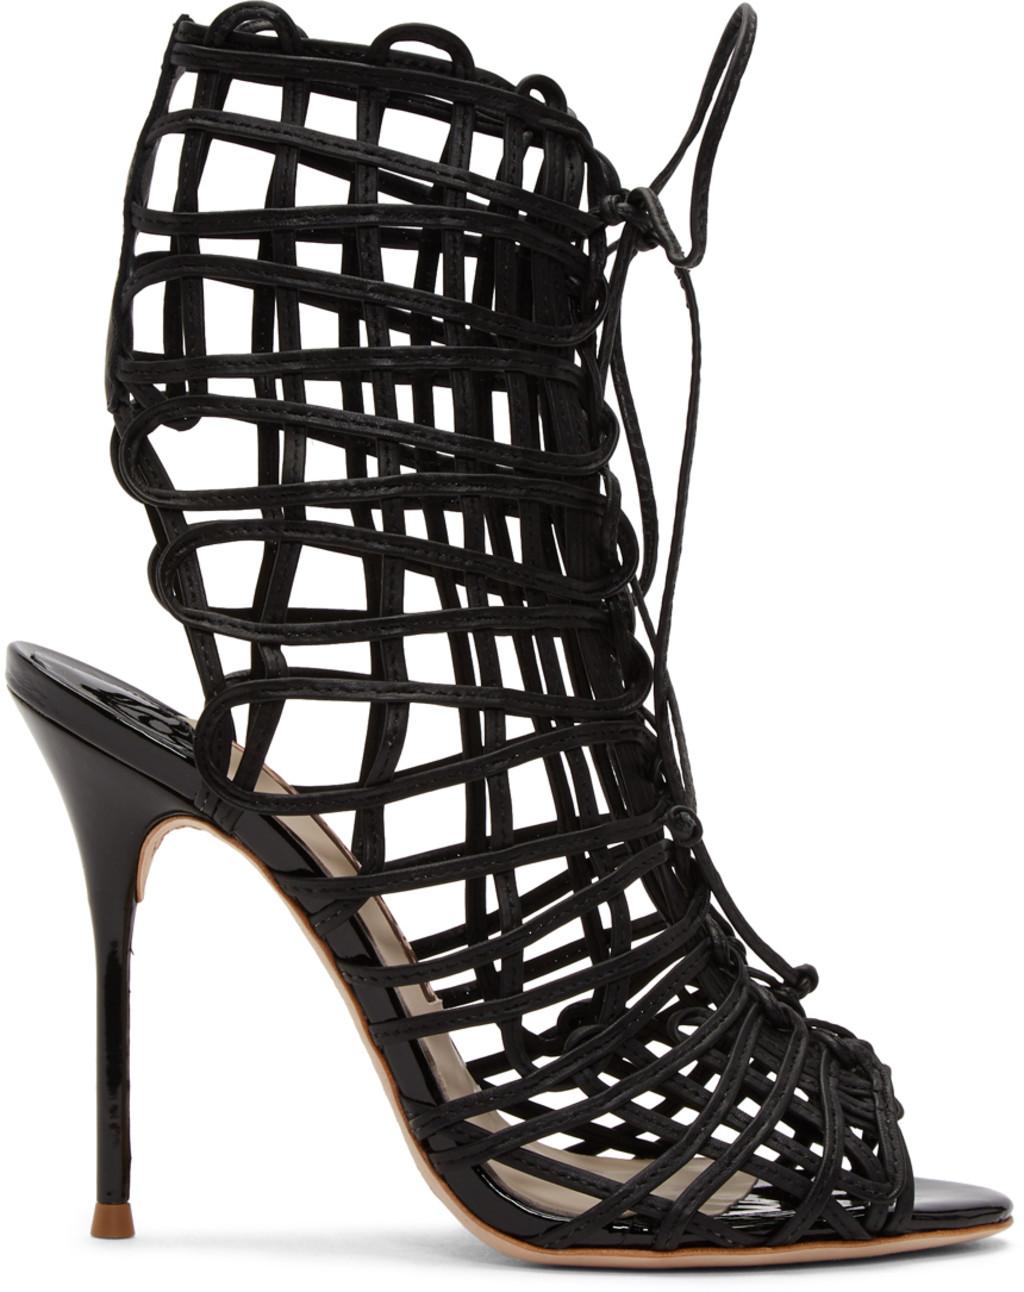 5916aee4cf976f ... Sophia Webster shoes for Women SSENSE great fit 32a1a e8ea8  Black ...